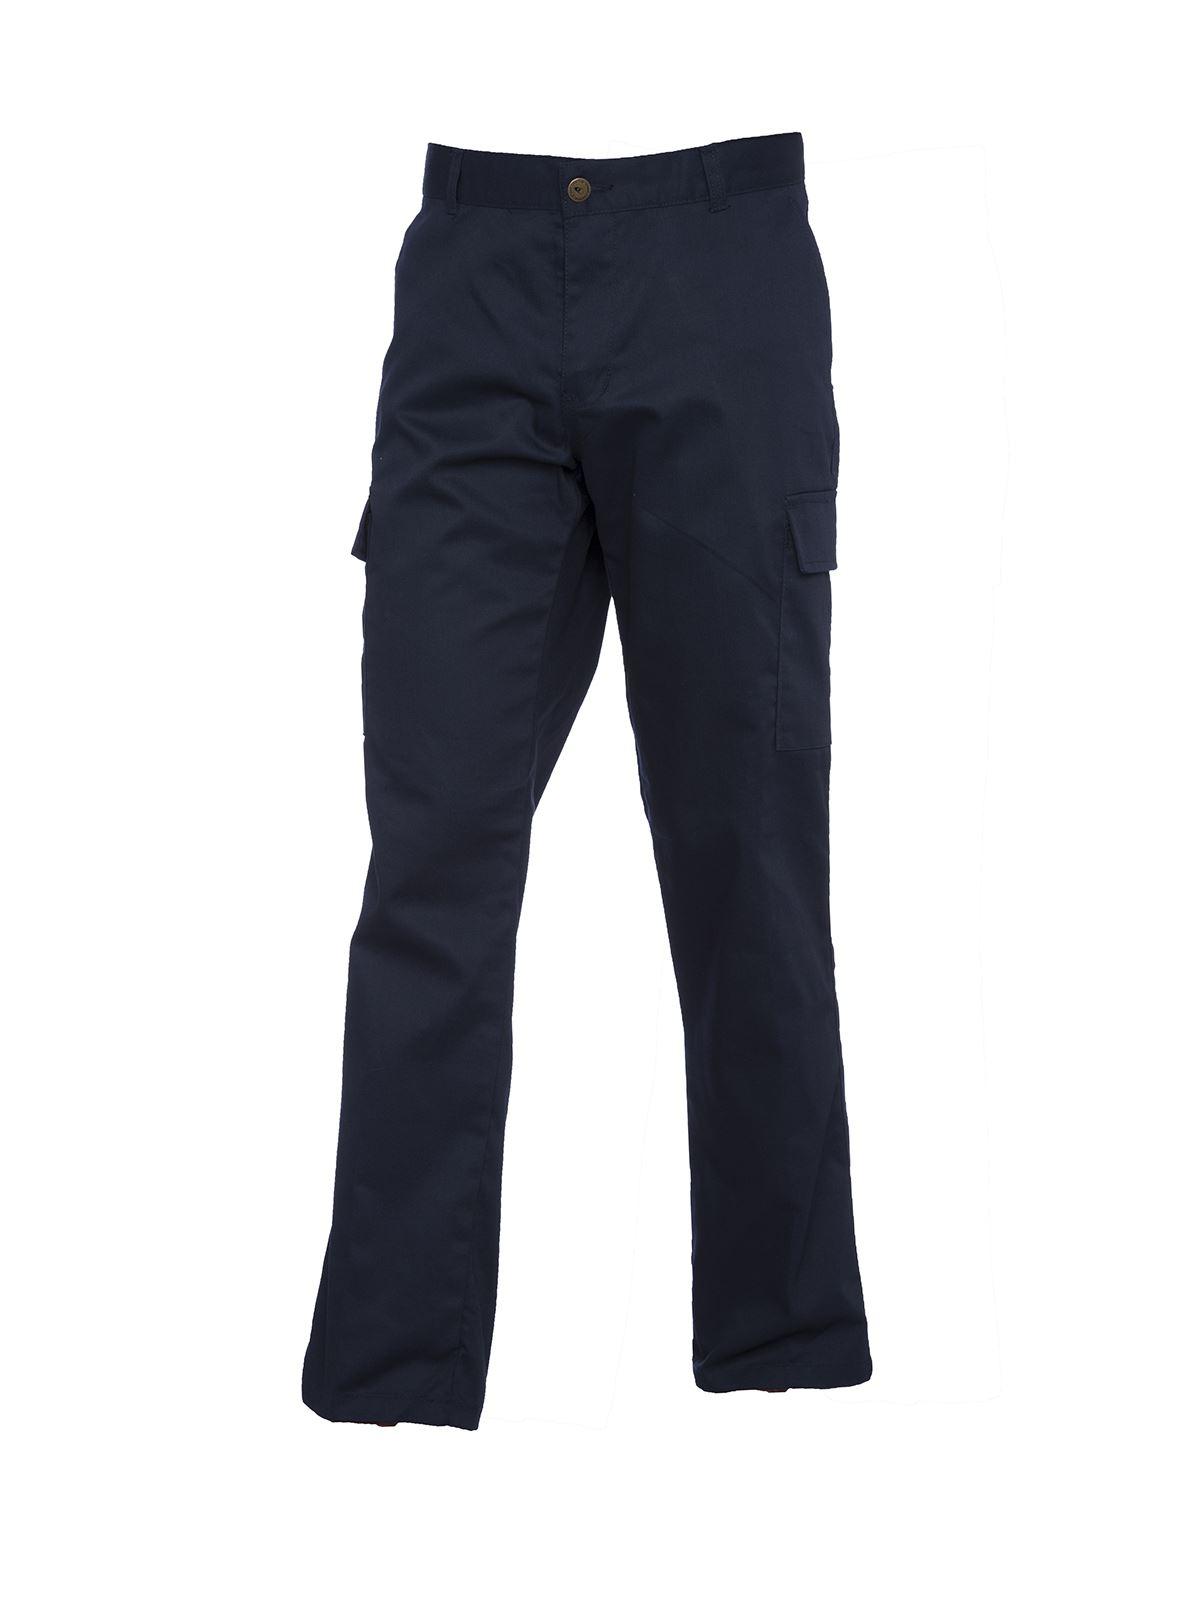 uneek ladies cargo work trousers women combat safety. Black Bedroom Furniture Sets. Home Design Ideas